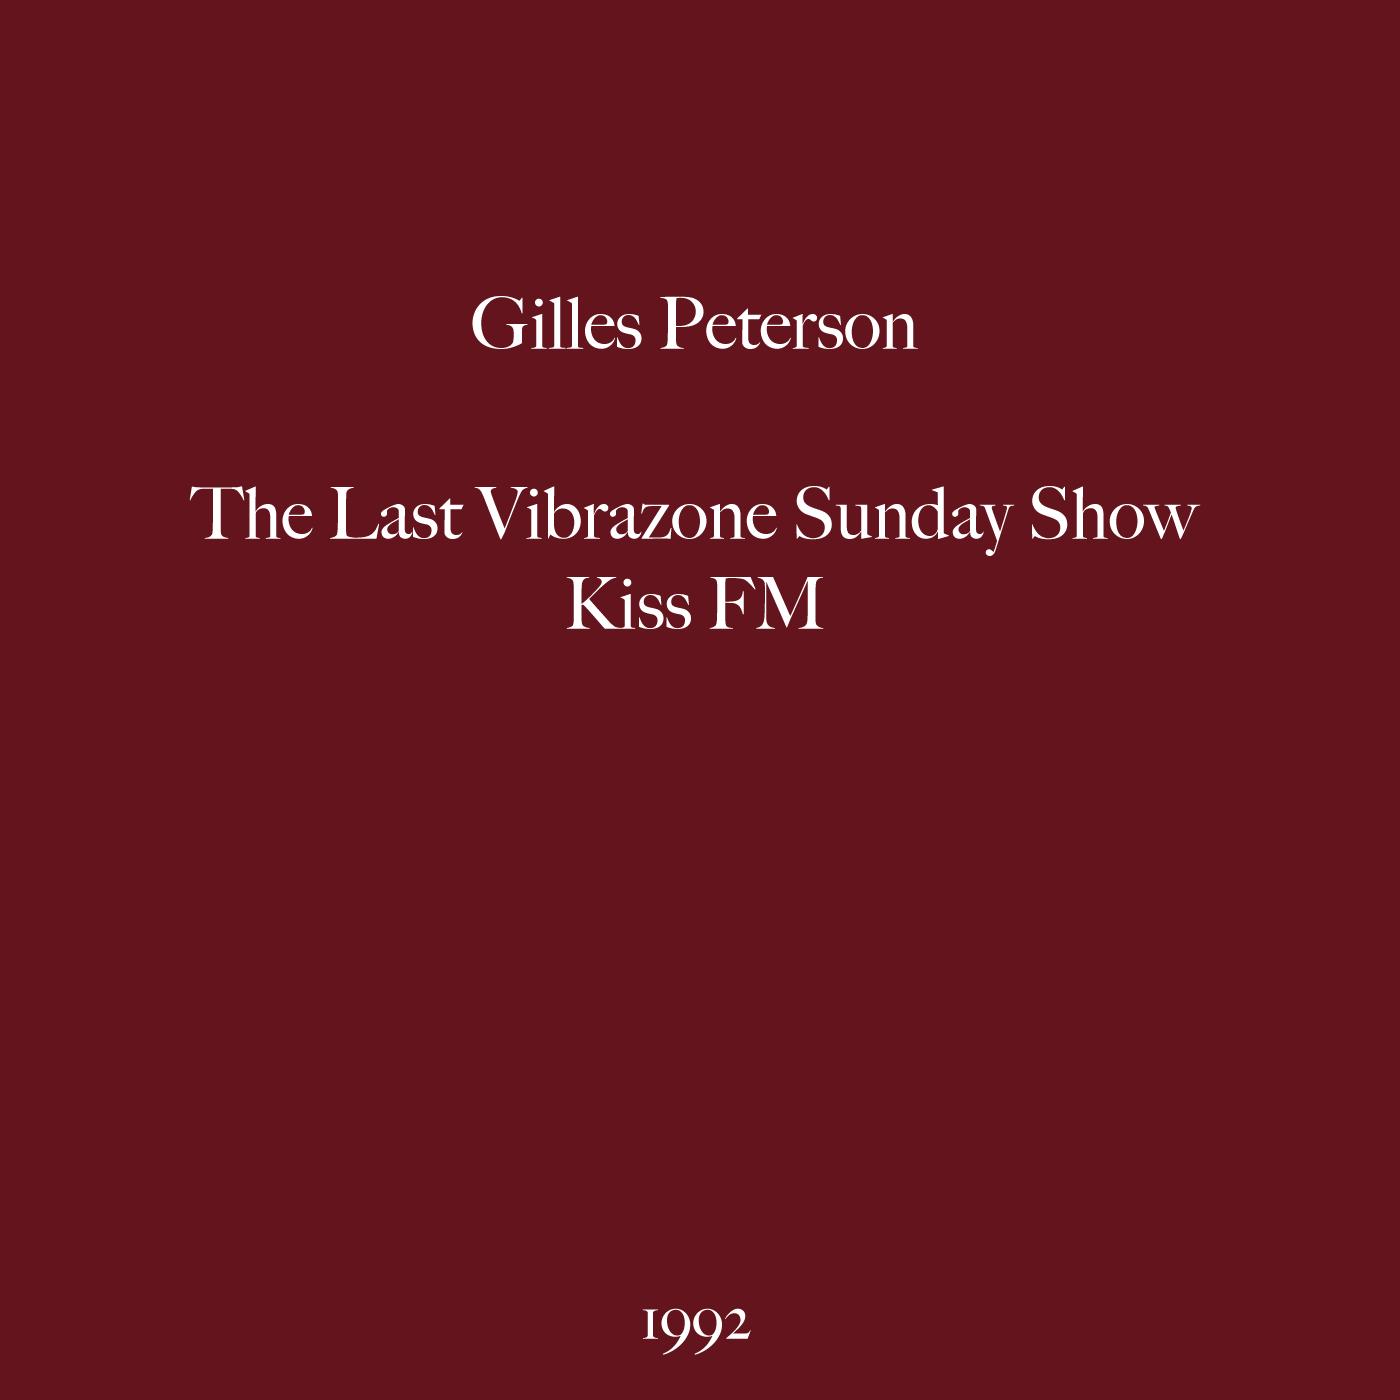 Gilles Peterson, All Winners Show, Kiss FM, 1992, Class, Jazz, Vibrazone, Recording, Pirate, Radio, Classic